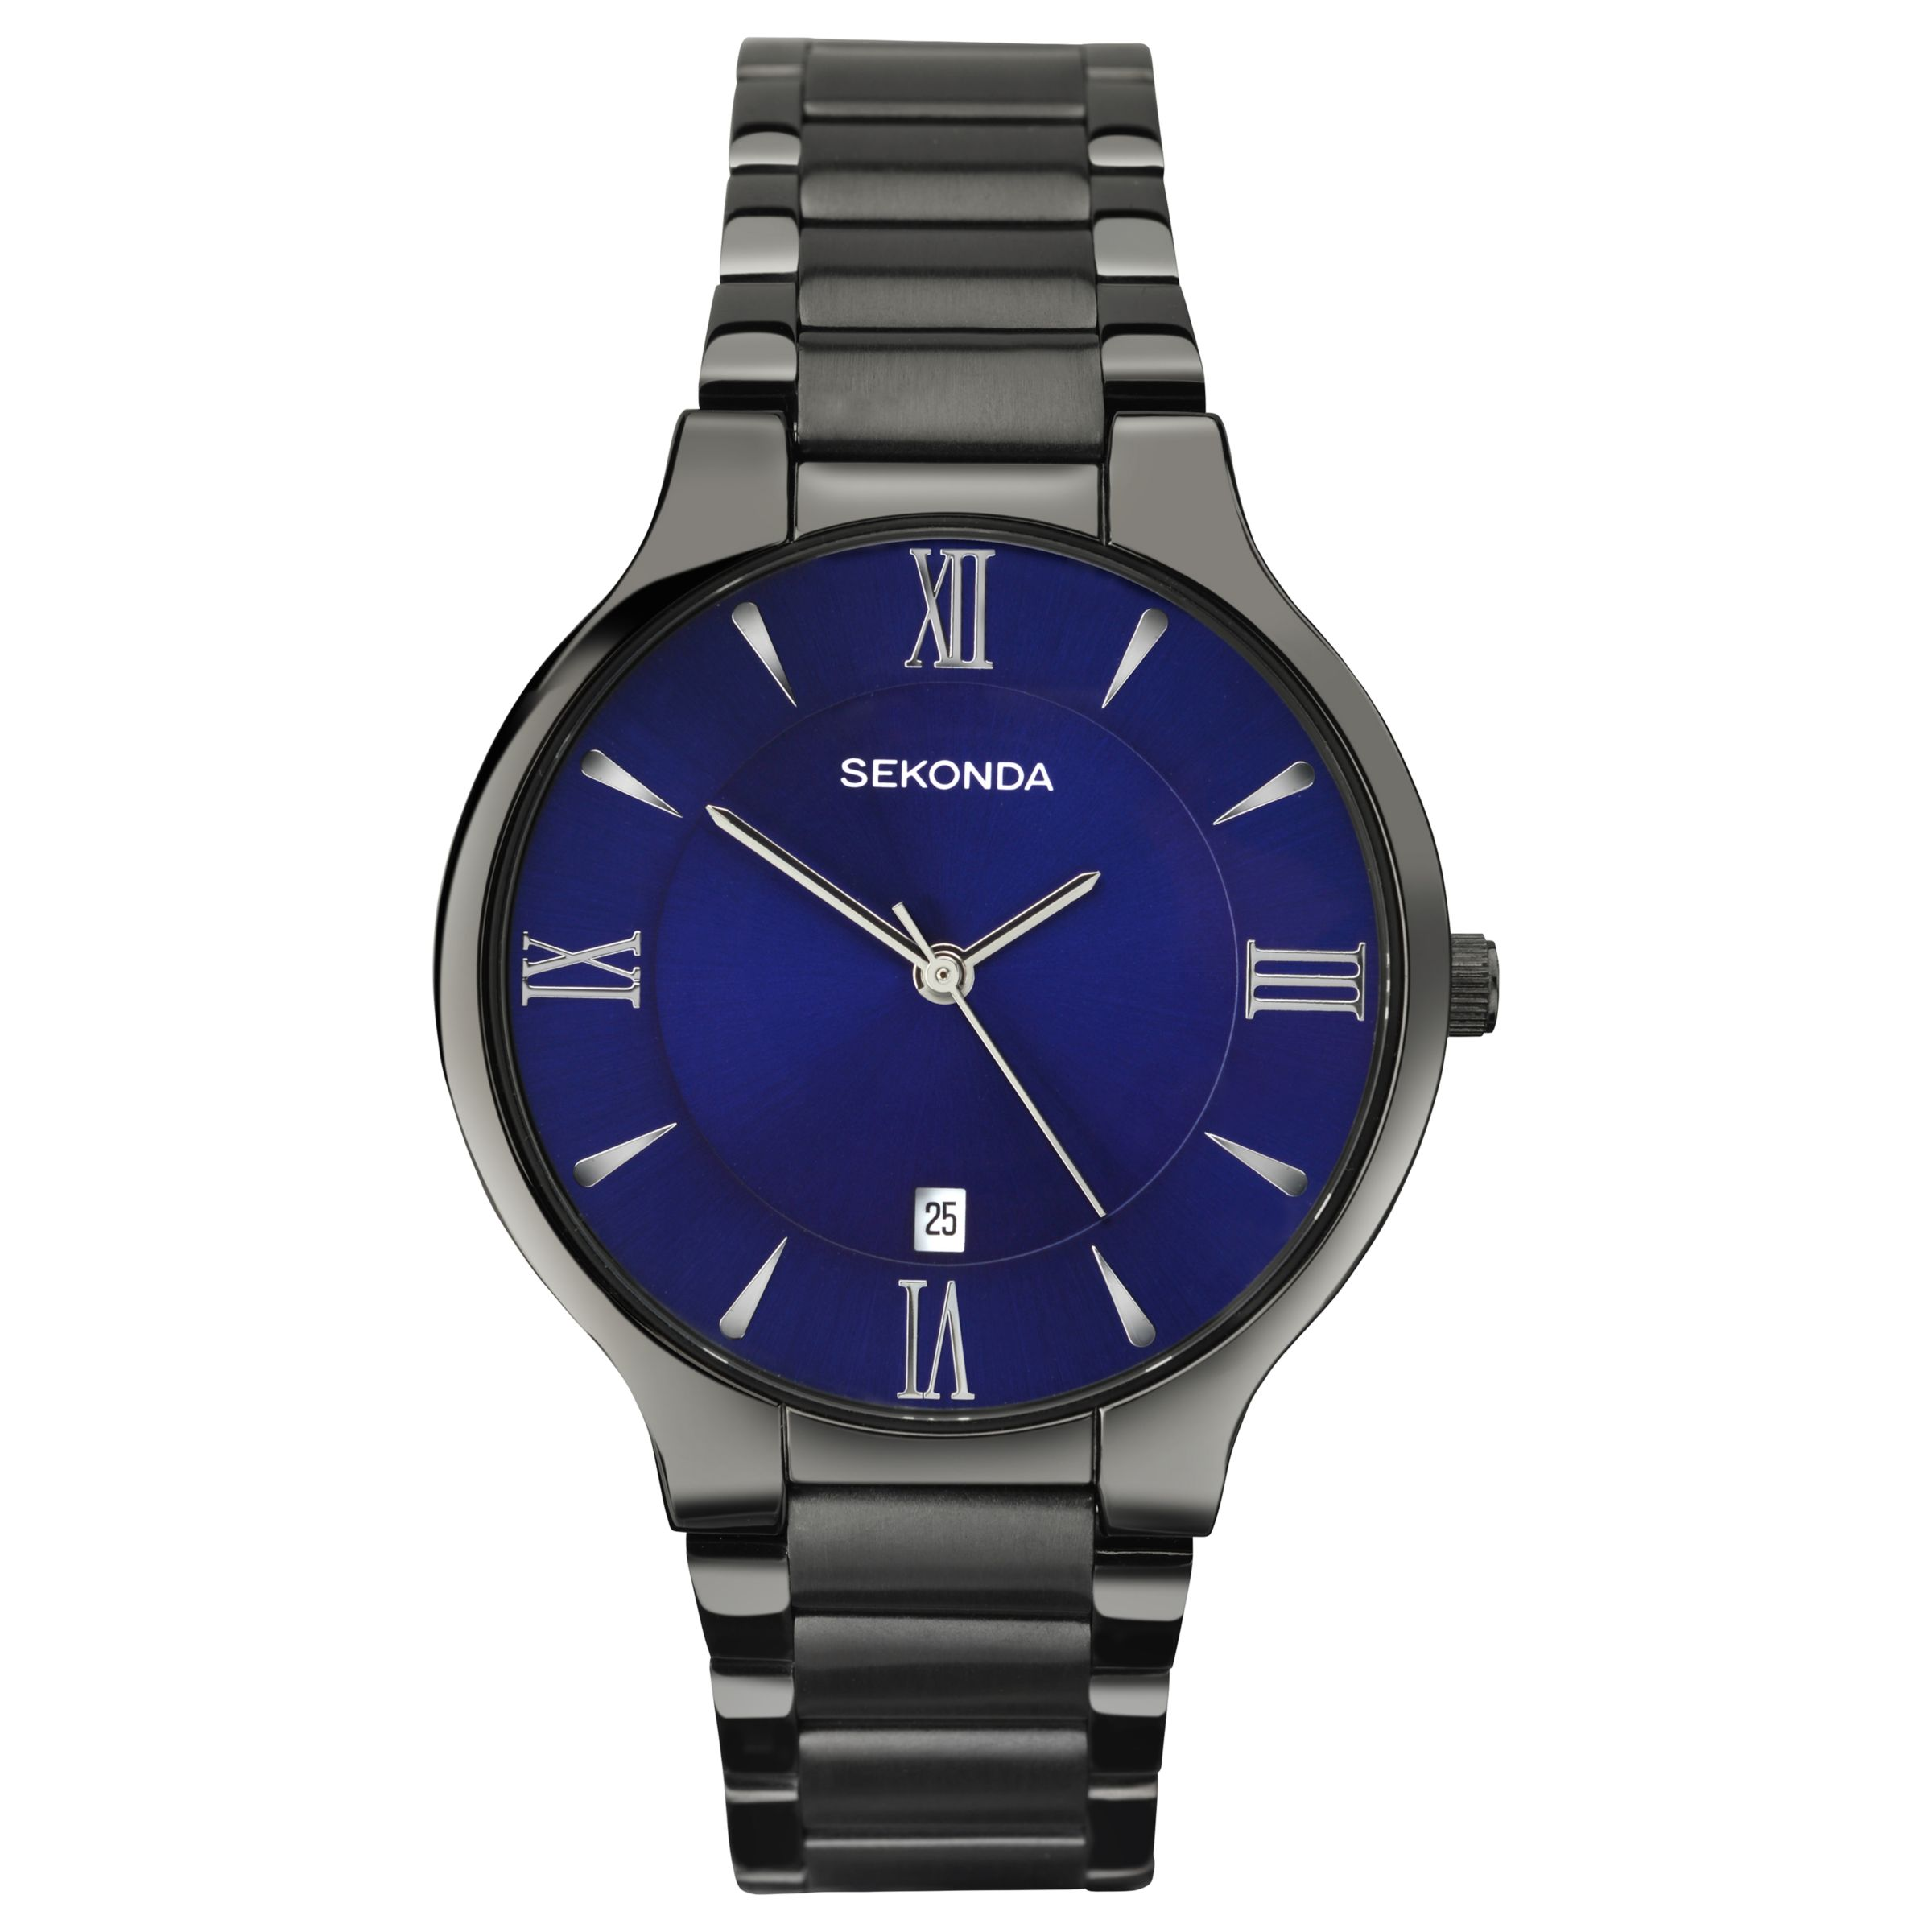 Sekonda Sekonda 1140.00 Men's Date Bracelet Strap Watch, Gunmetal/Indigo